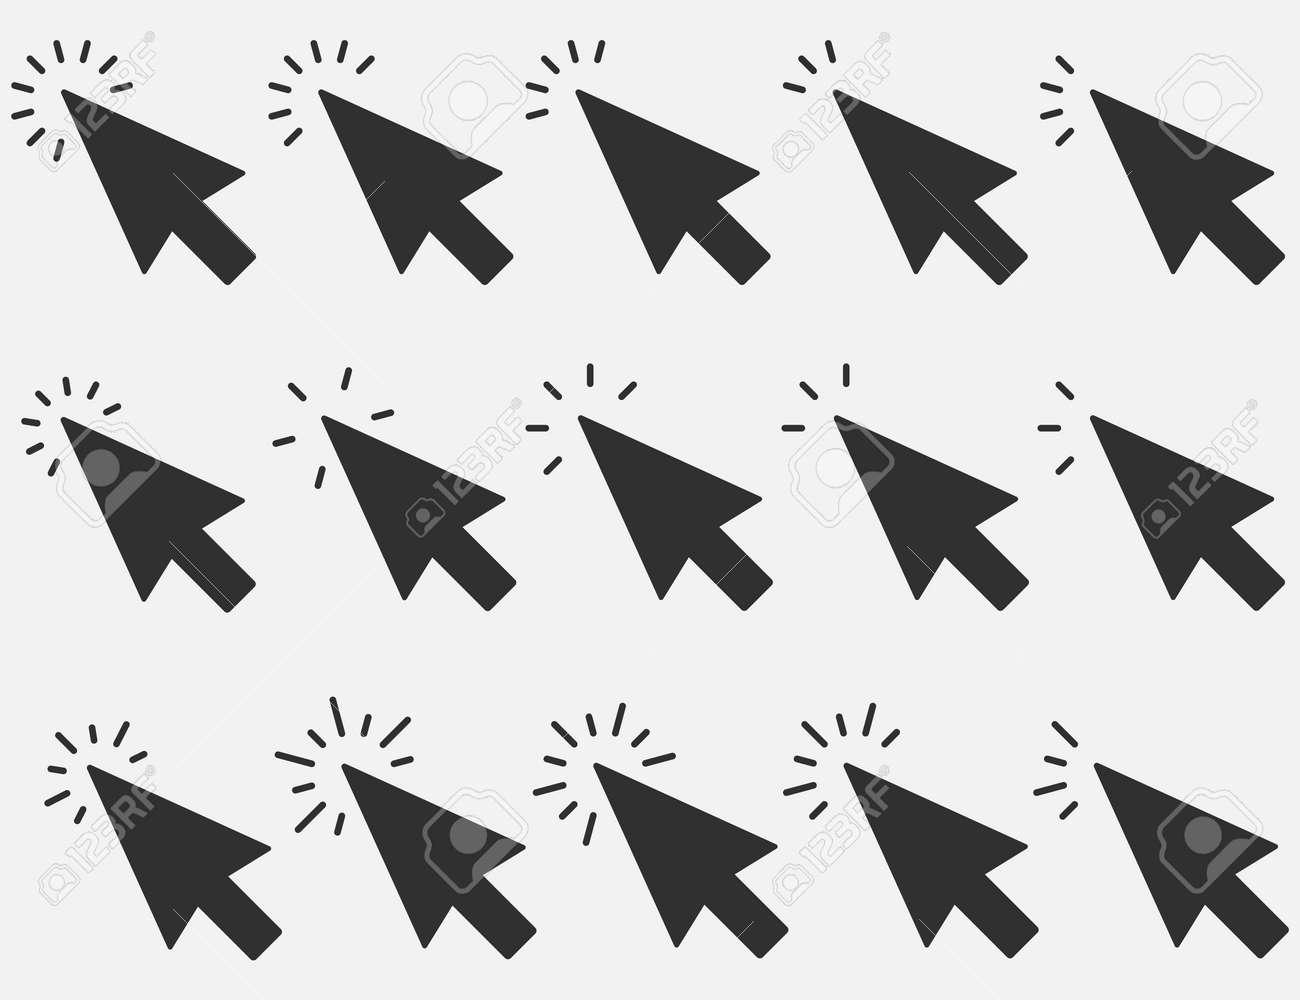 Set of Clicks icon. Cursor sign. Clicking Arrow, Mouse Cursor Symbol. Vector illustration. Eps 10. - 166654260